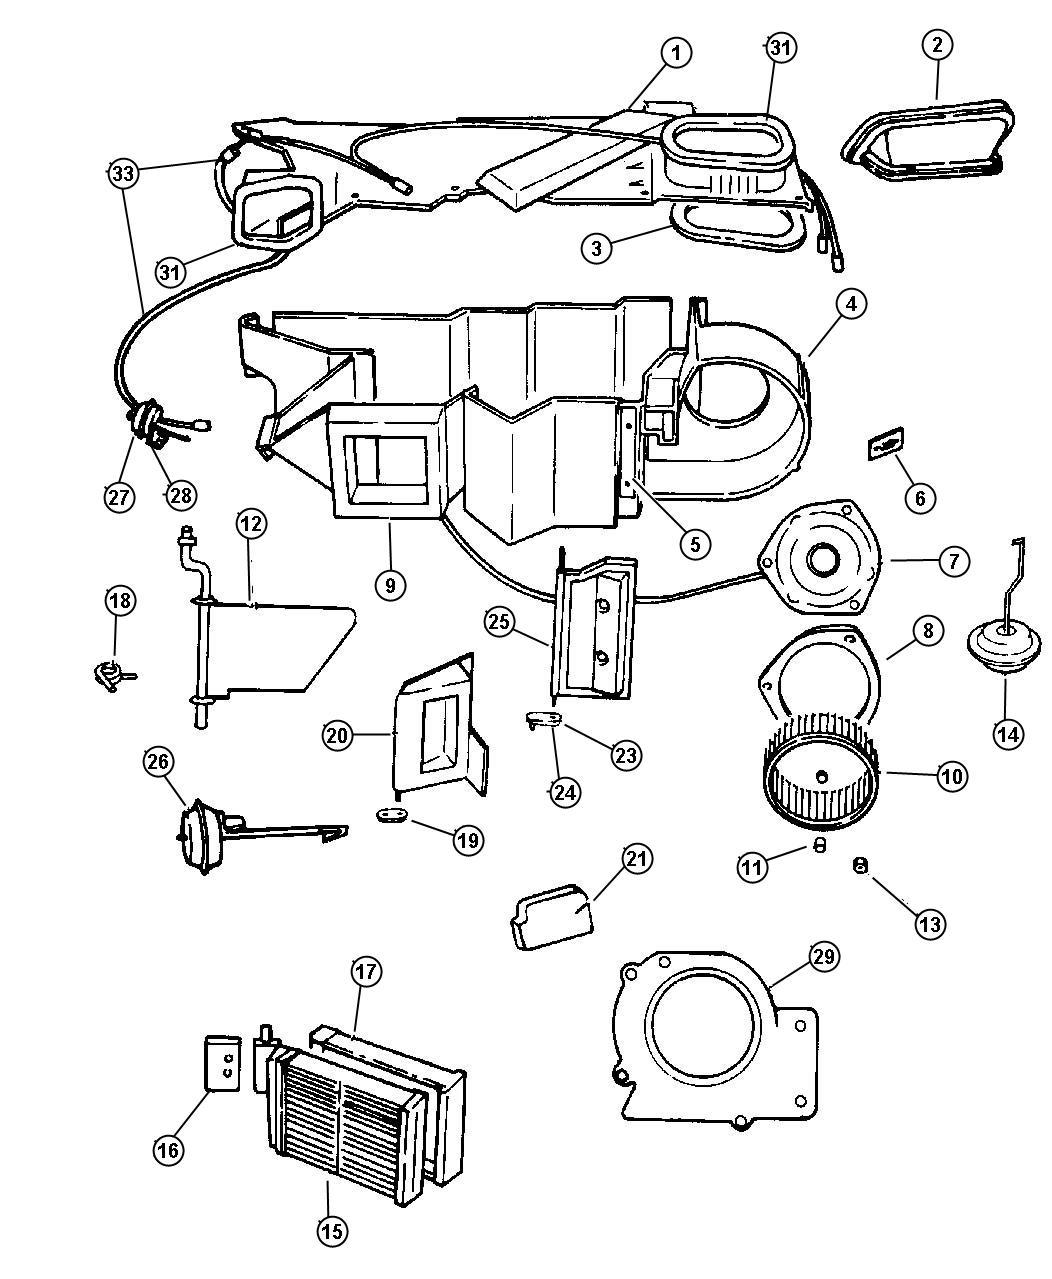 2000 Dodge Ram Blower Motor